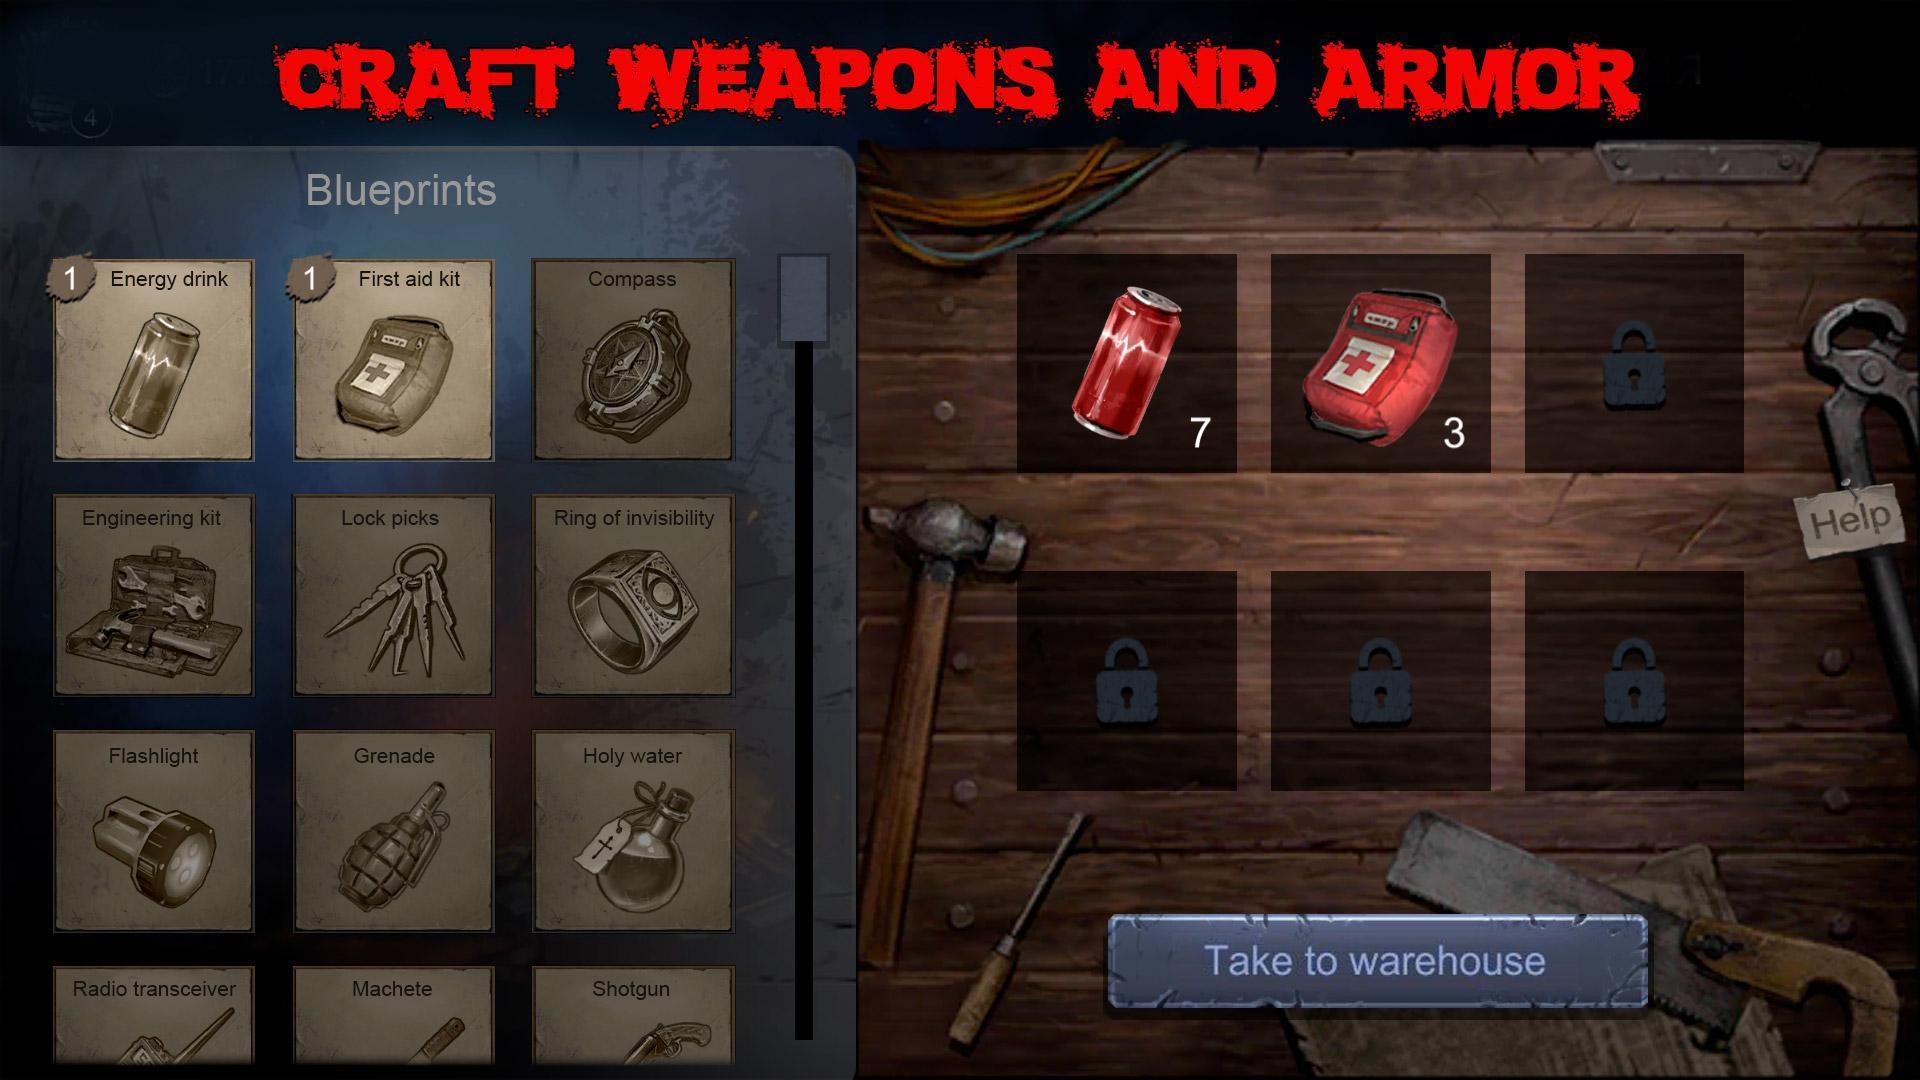 Horrorfield Multiplayer Survival Horror Game 1.3.6 Screenshot 11